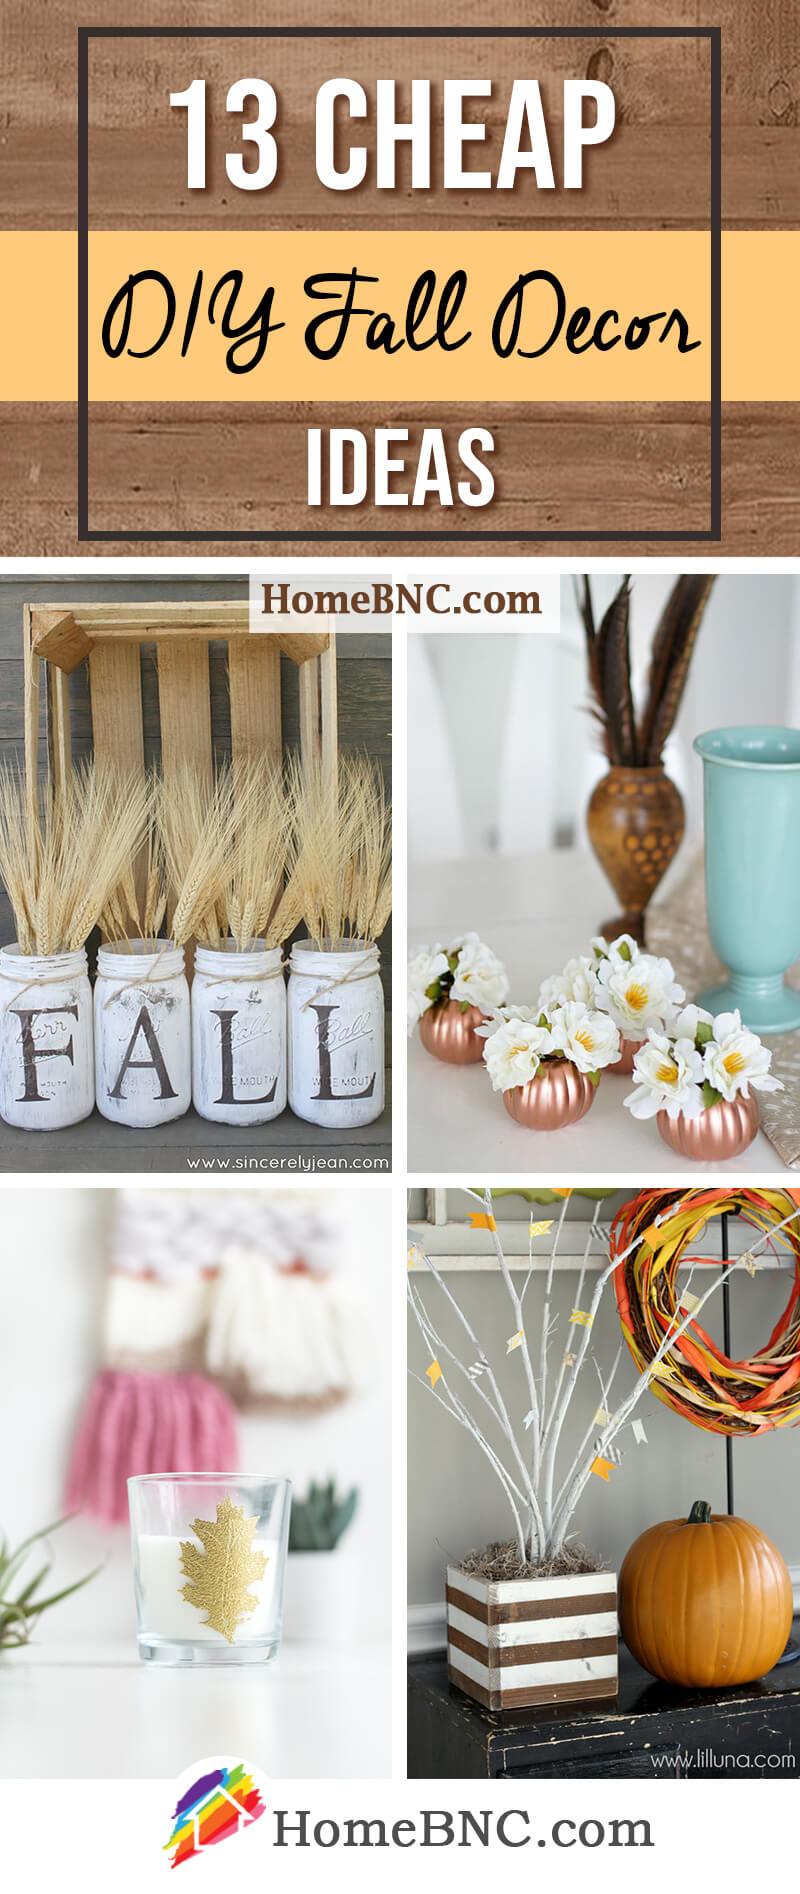 Cheap DIY Fall Decor Ideas